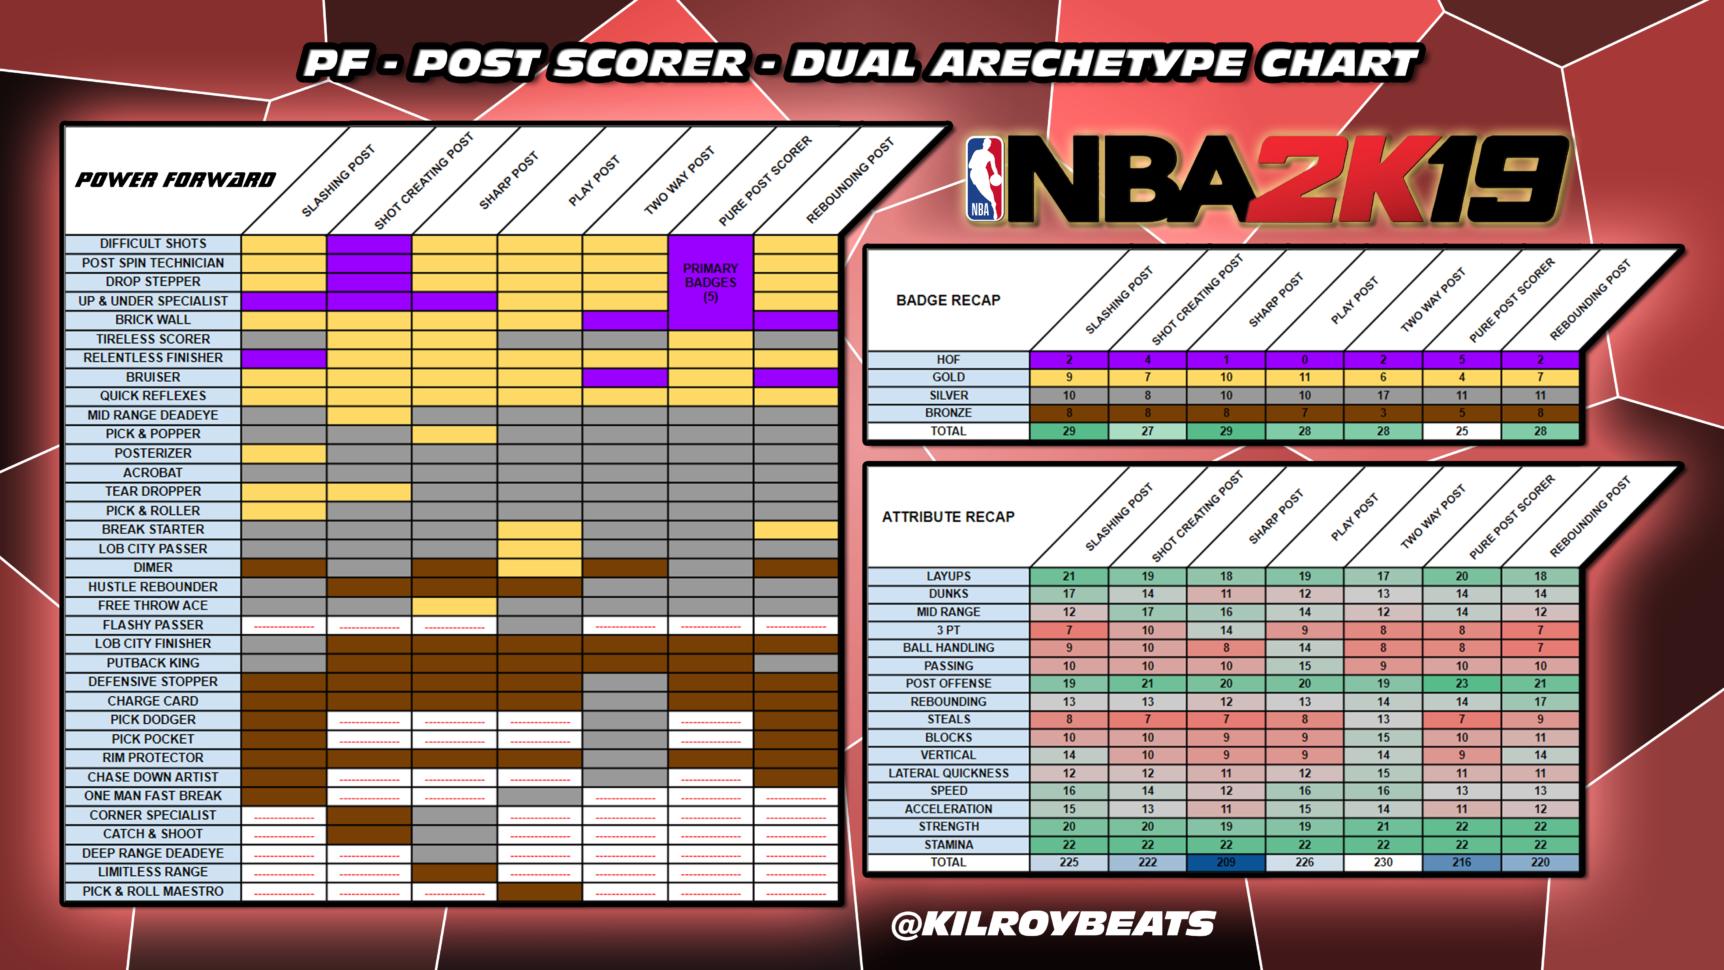 Nba 2K19 Badges Spreadsheet With Regard To Nba 2K19  Power Forward  Post Scorer Primary Dual Archetype Chart